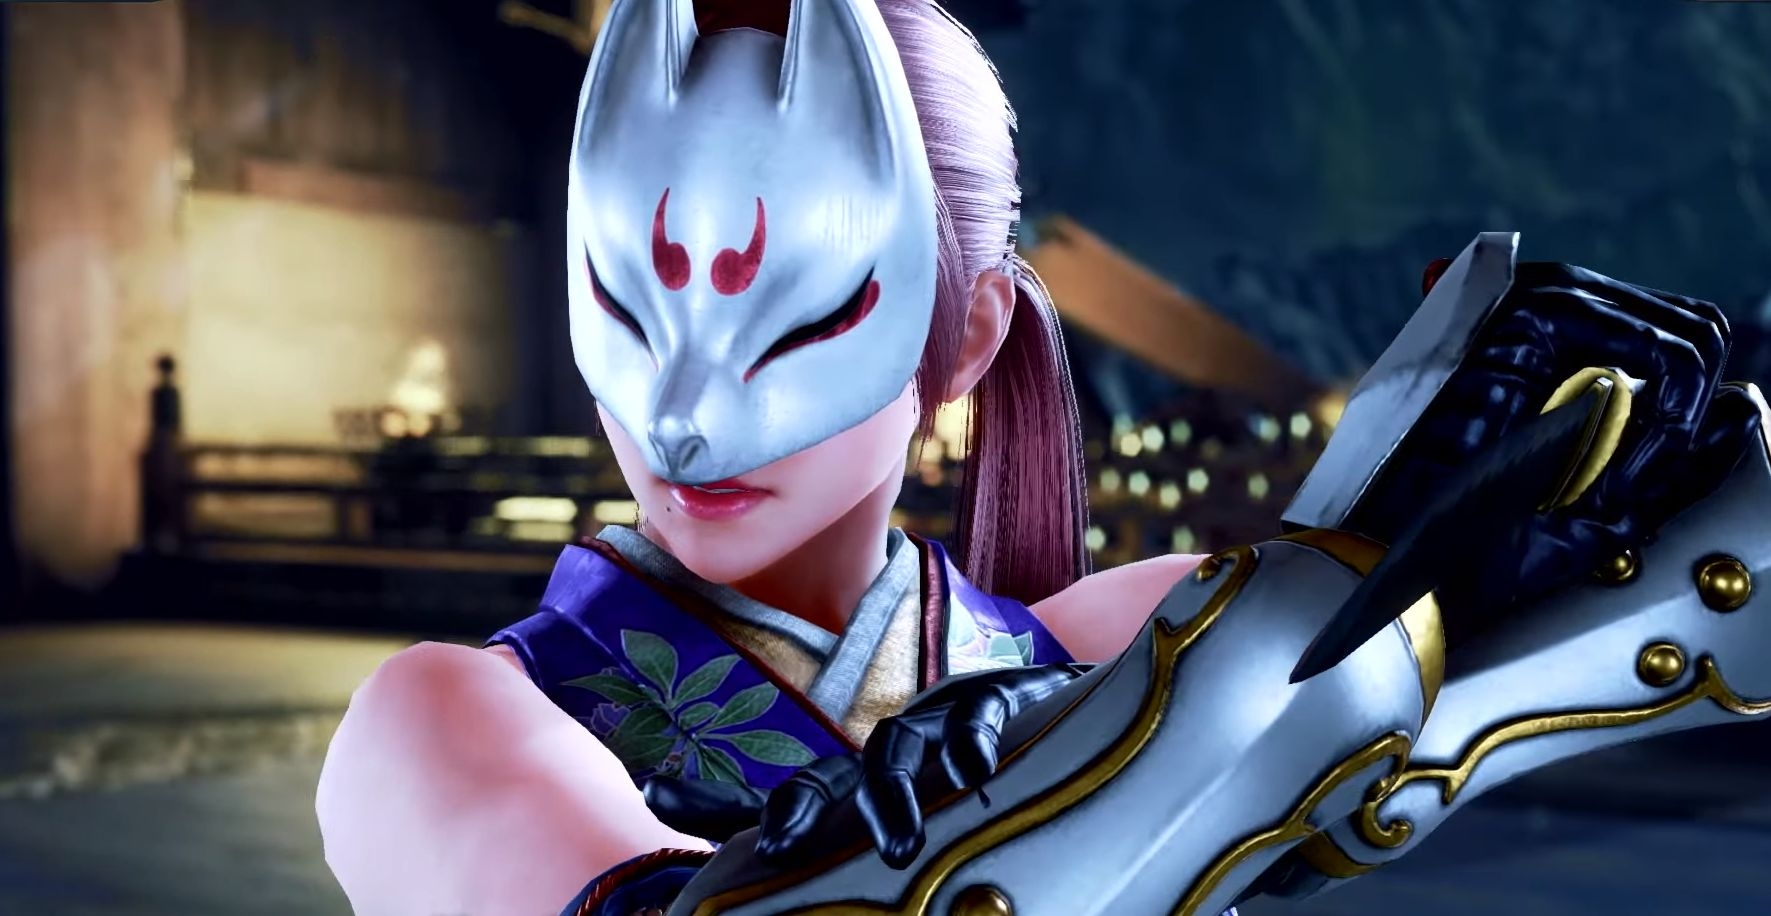 Tekken 7 Season 4 brings Kunimitsu and a Pac-Man theme